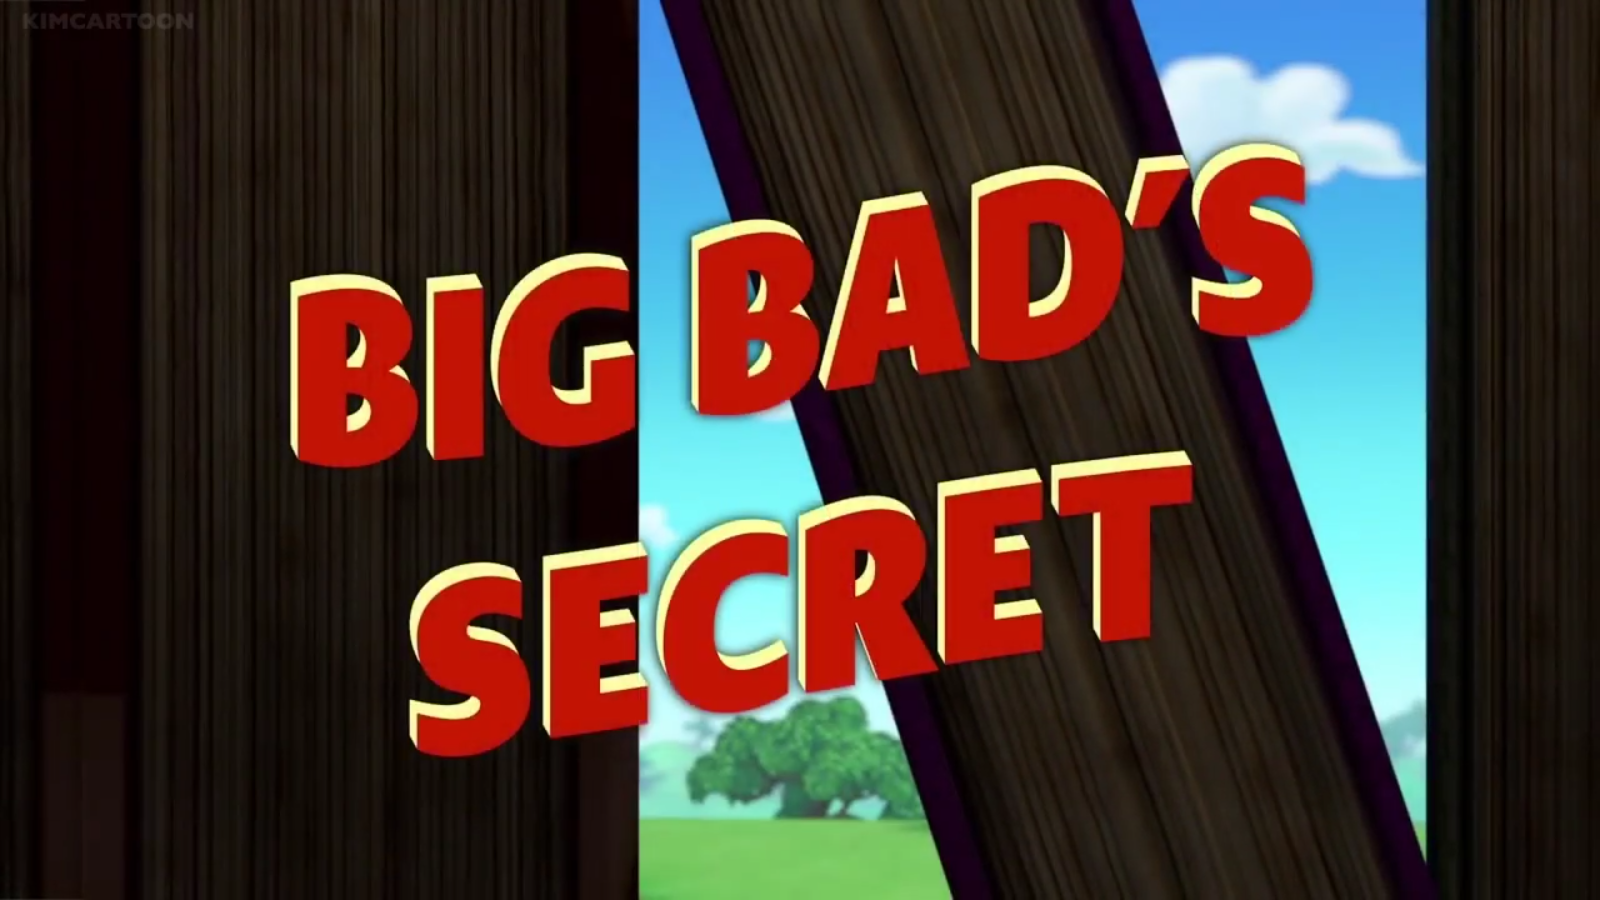 Big Bad's Secret